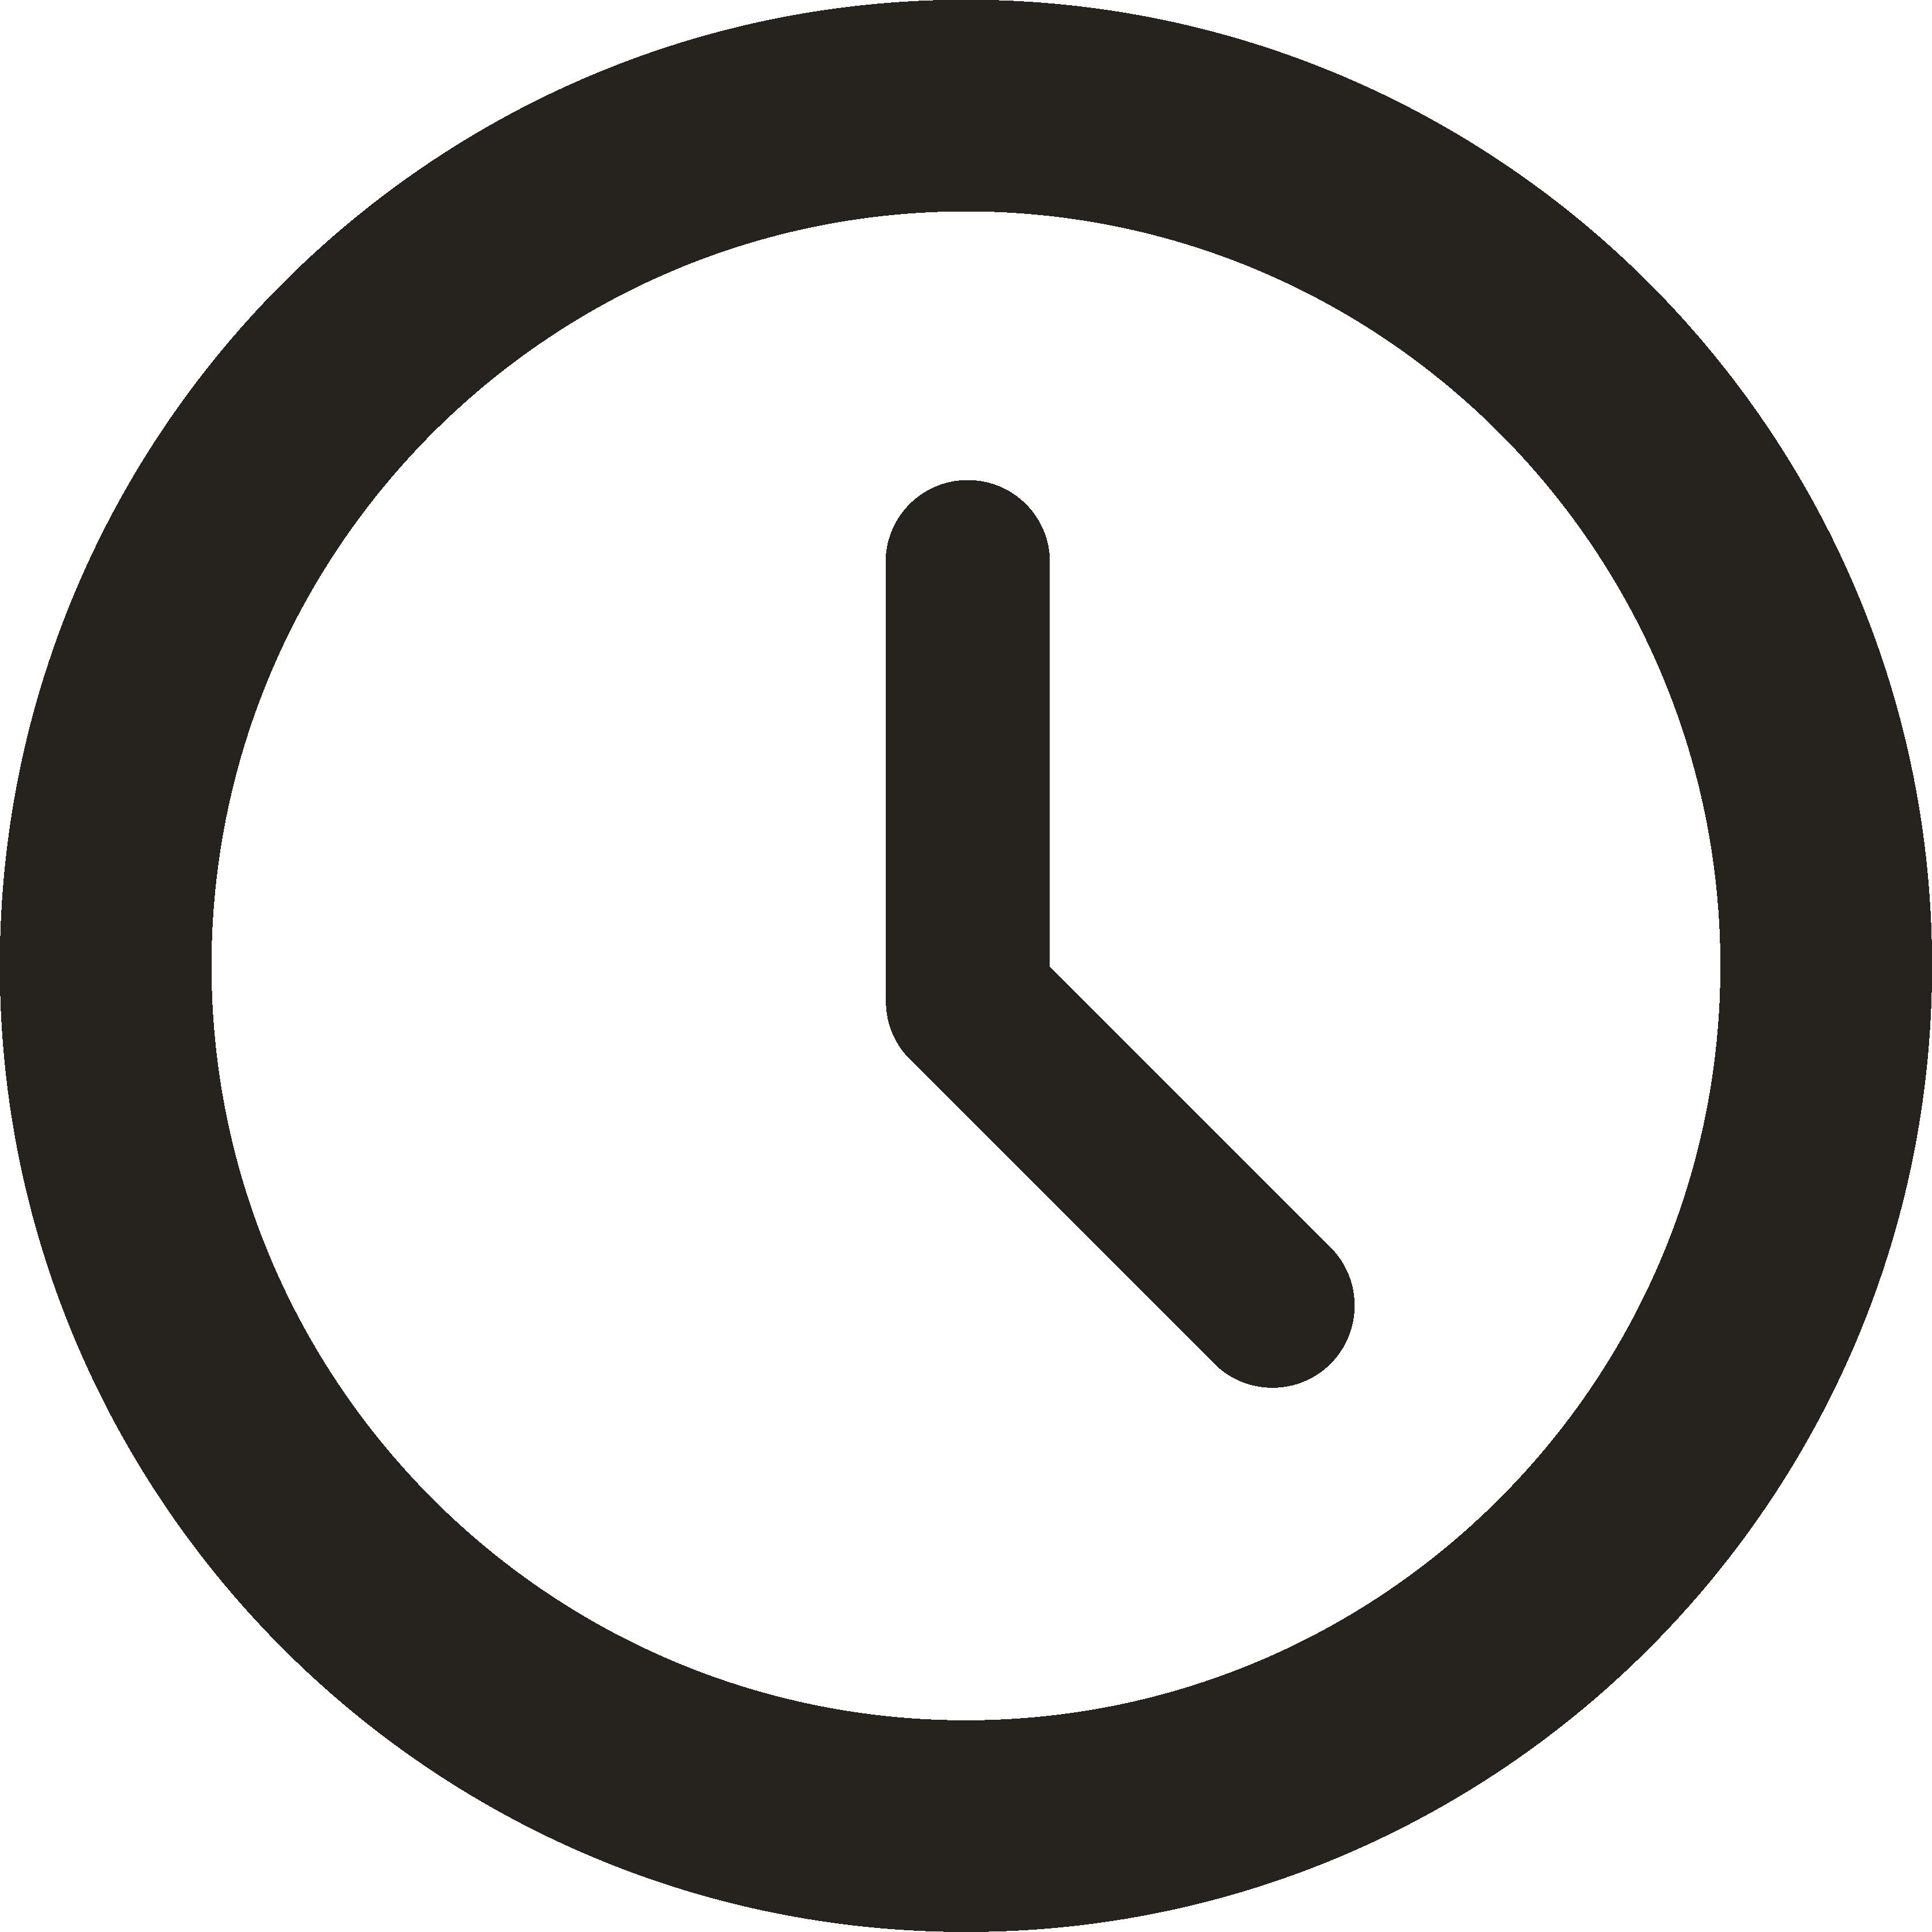 Klokke icon